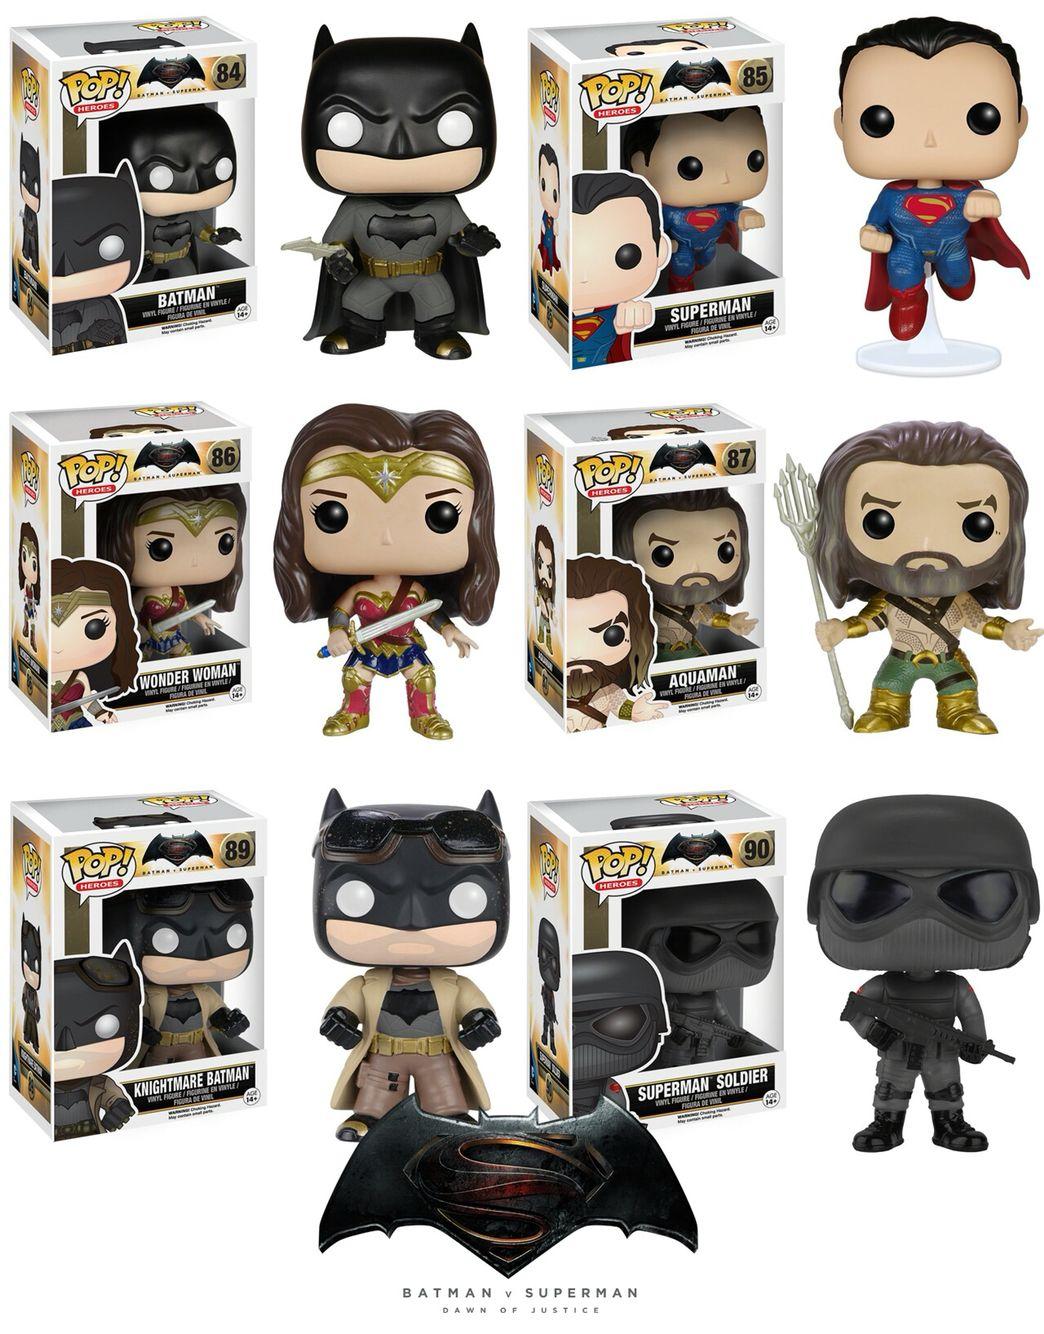 Batman V Superman Dawn of Justice Funko Pop collection